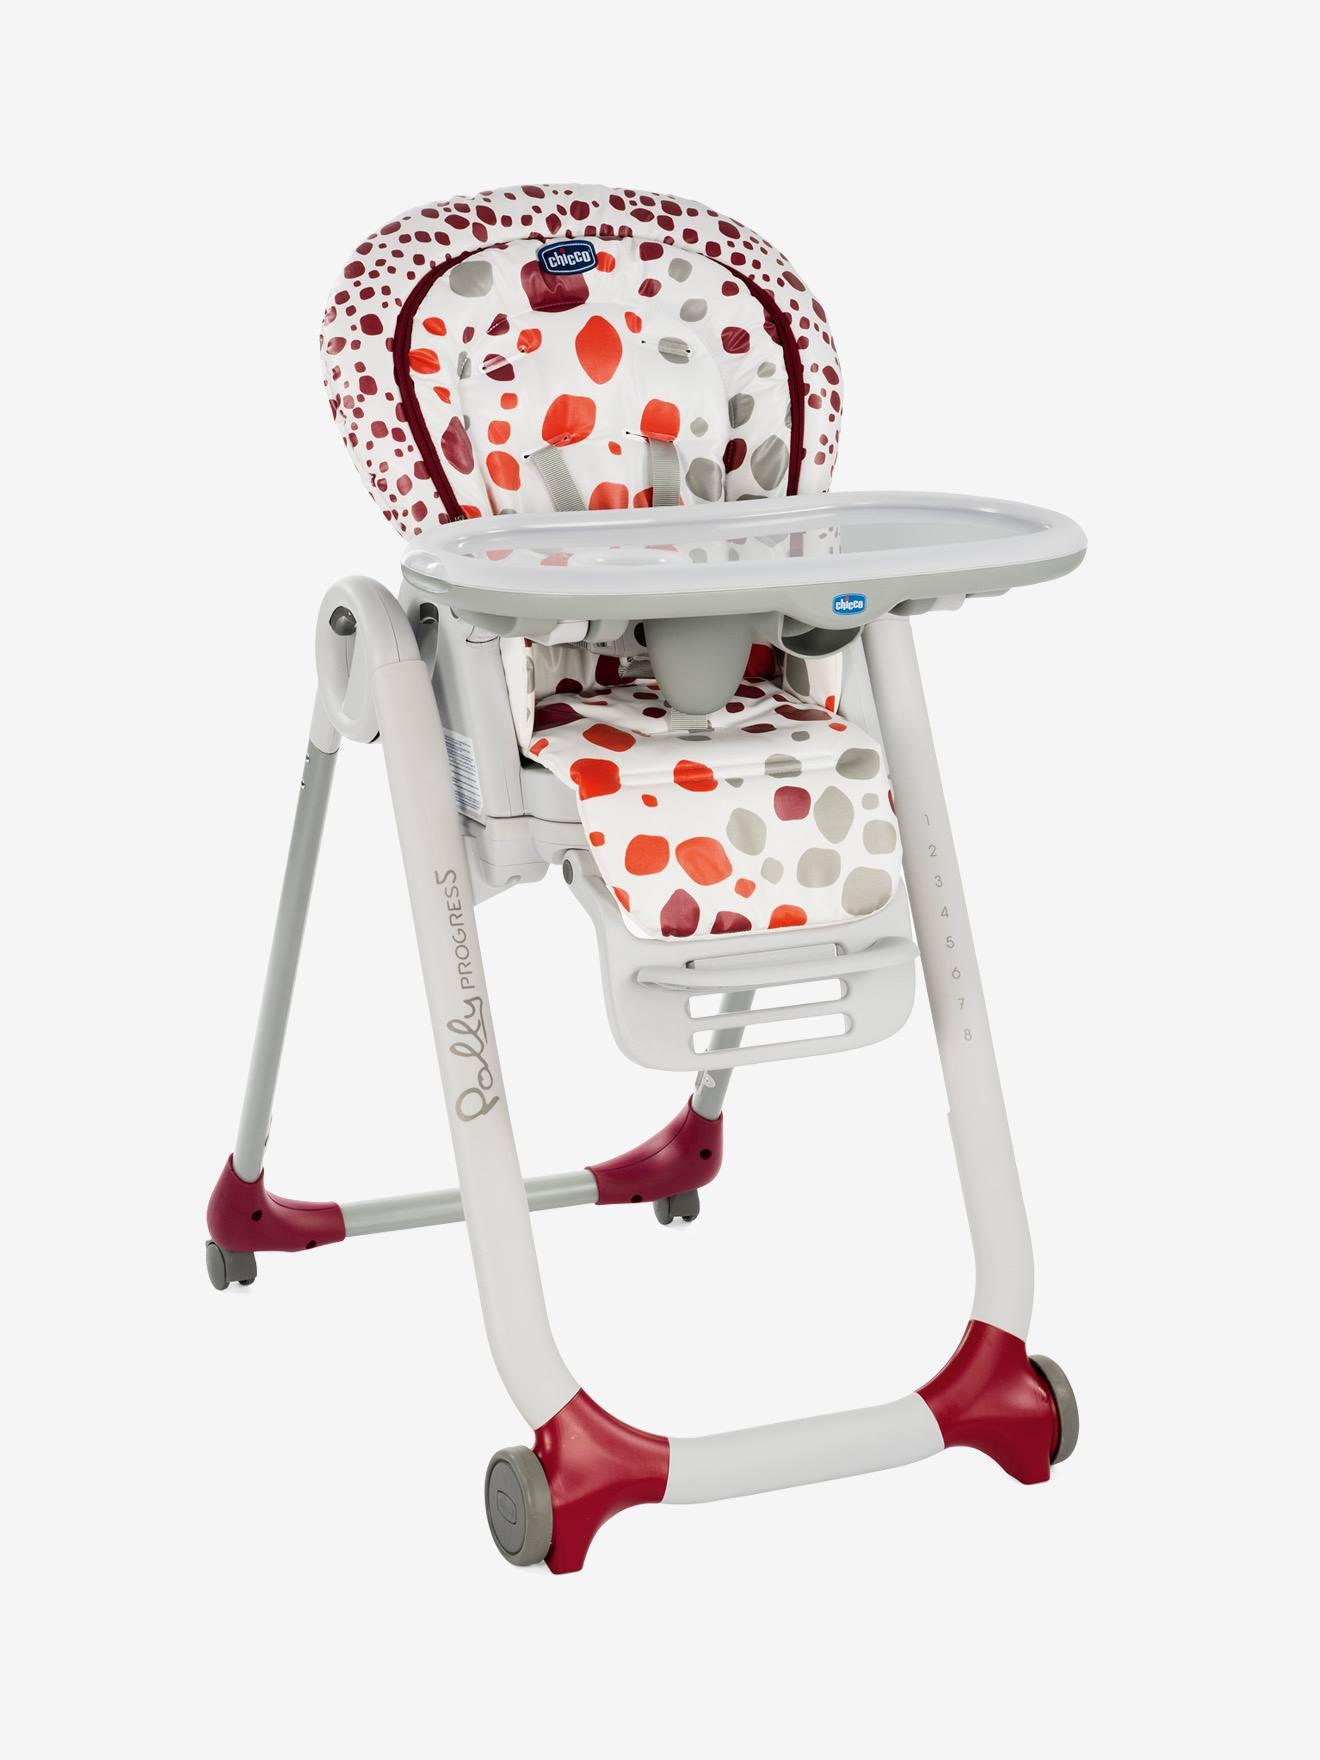 Chaise haute évolutive CHICCO Polly Progres5 imprimé rouge Chicco